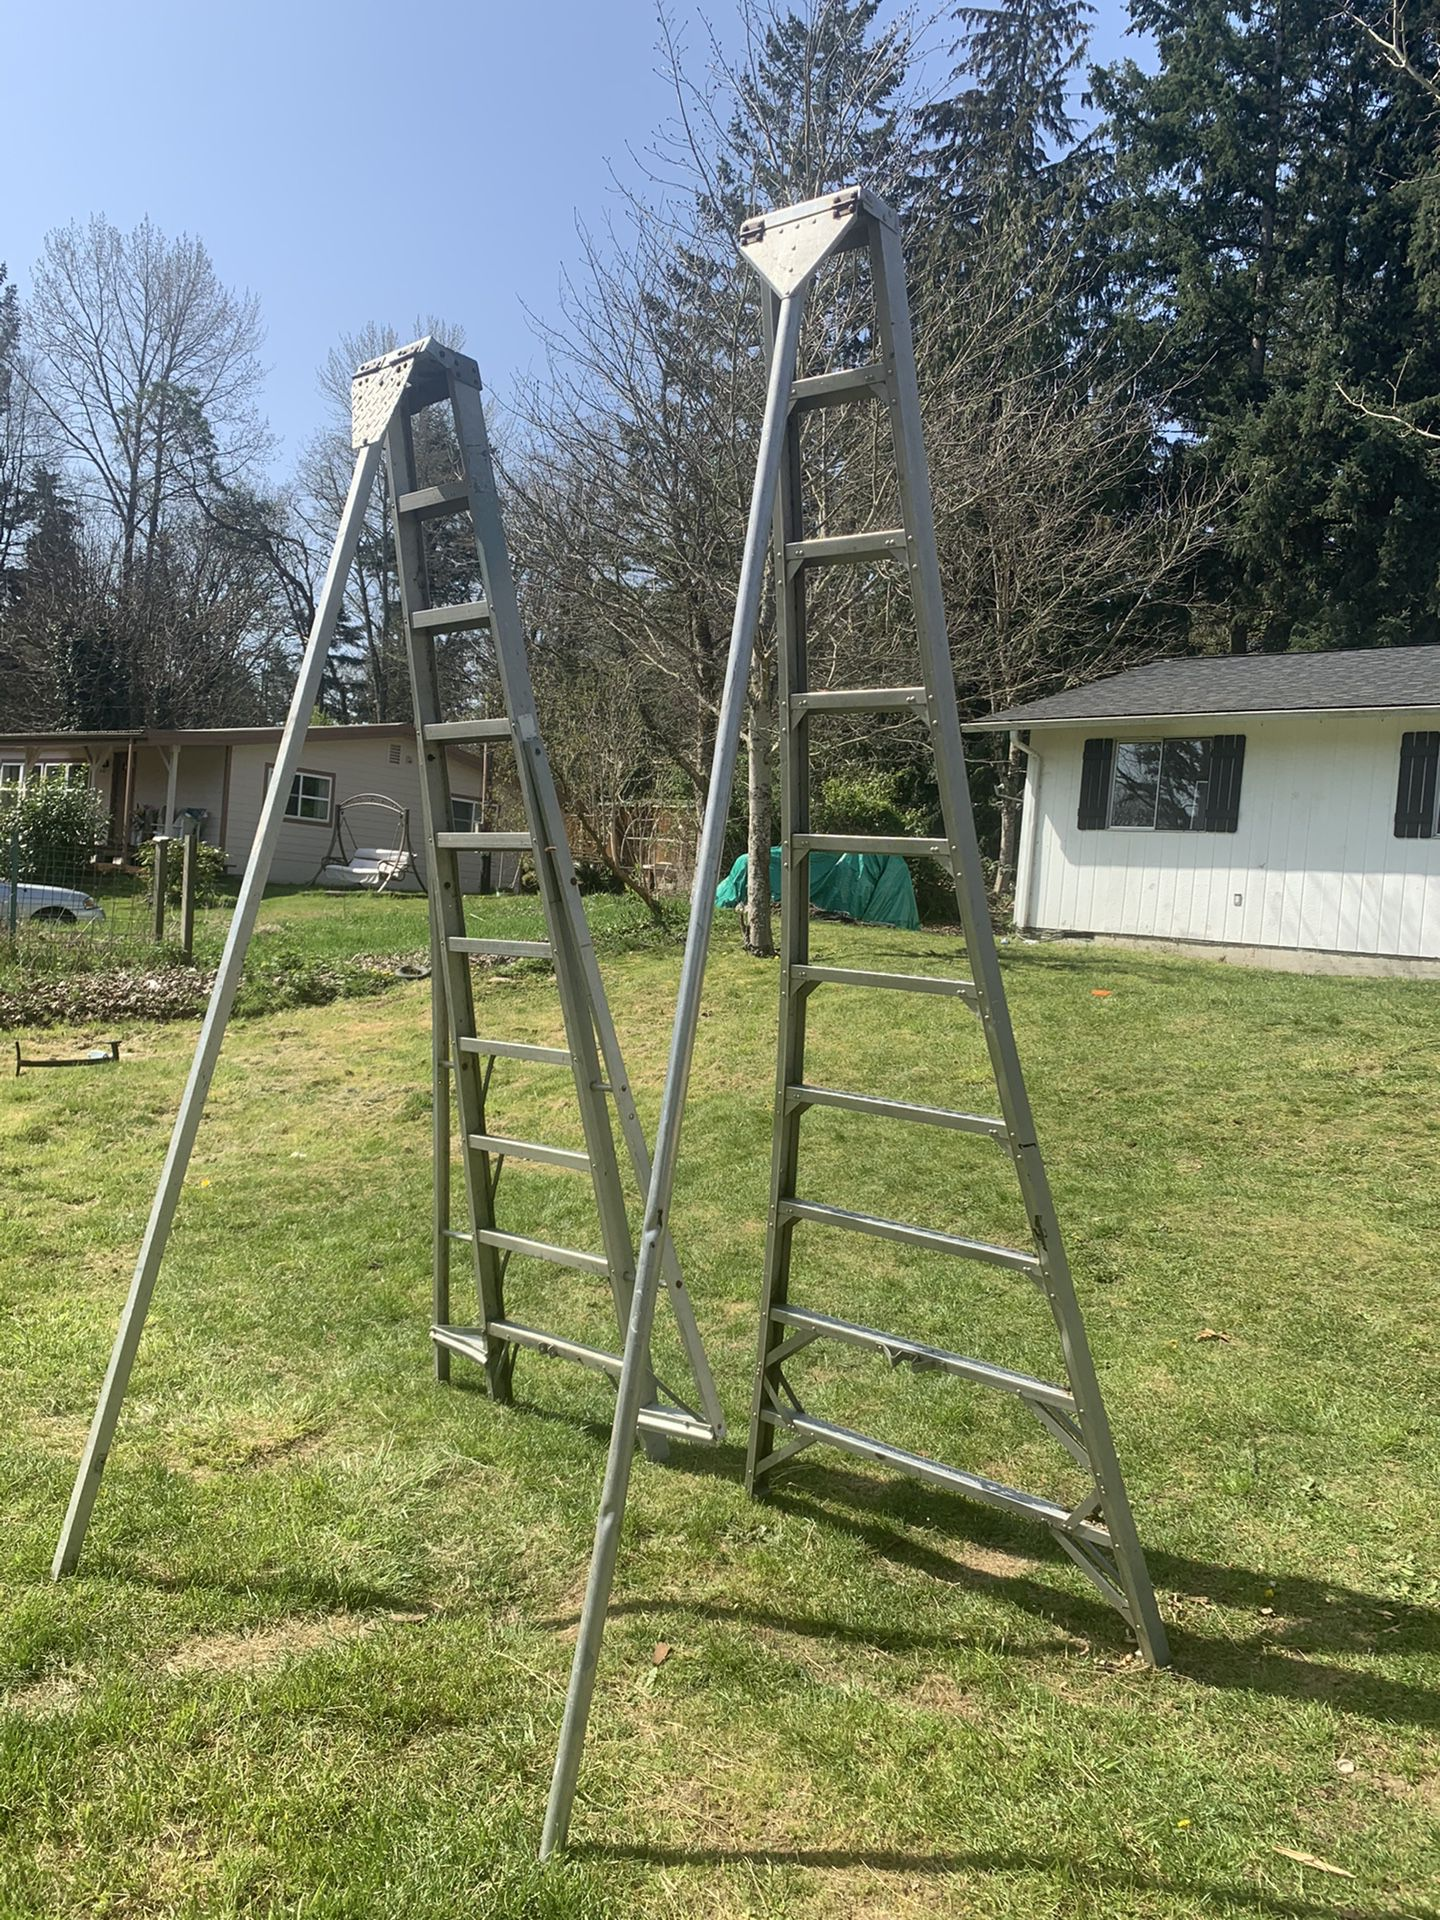 2 Long Ladder $175 And $200 Ladder OBO